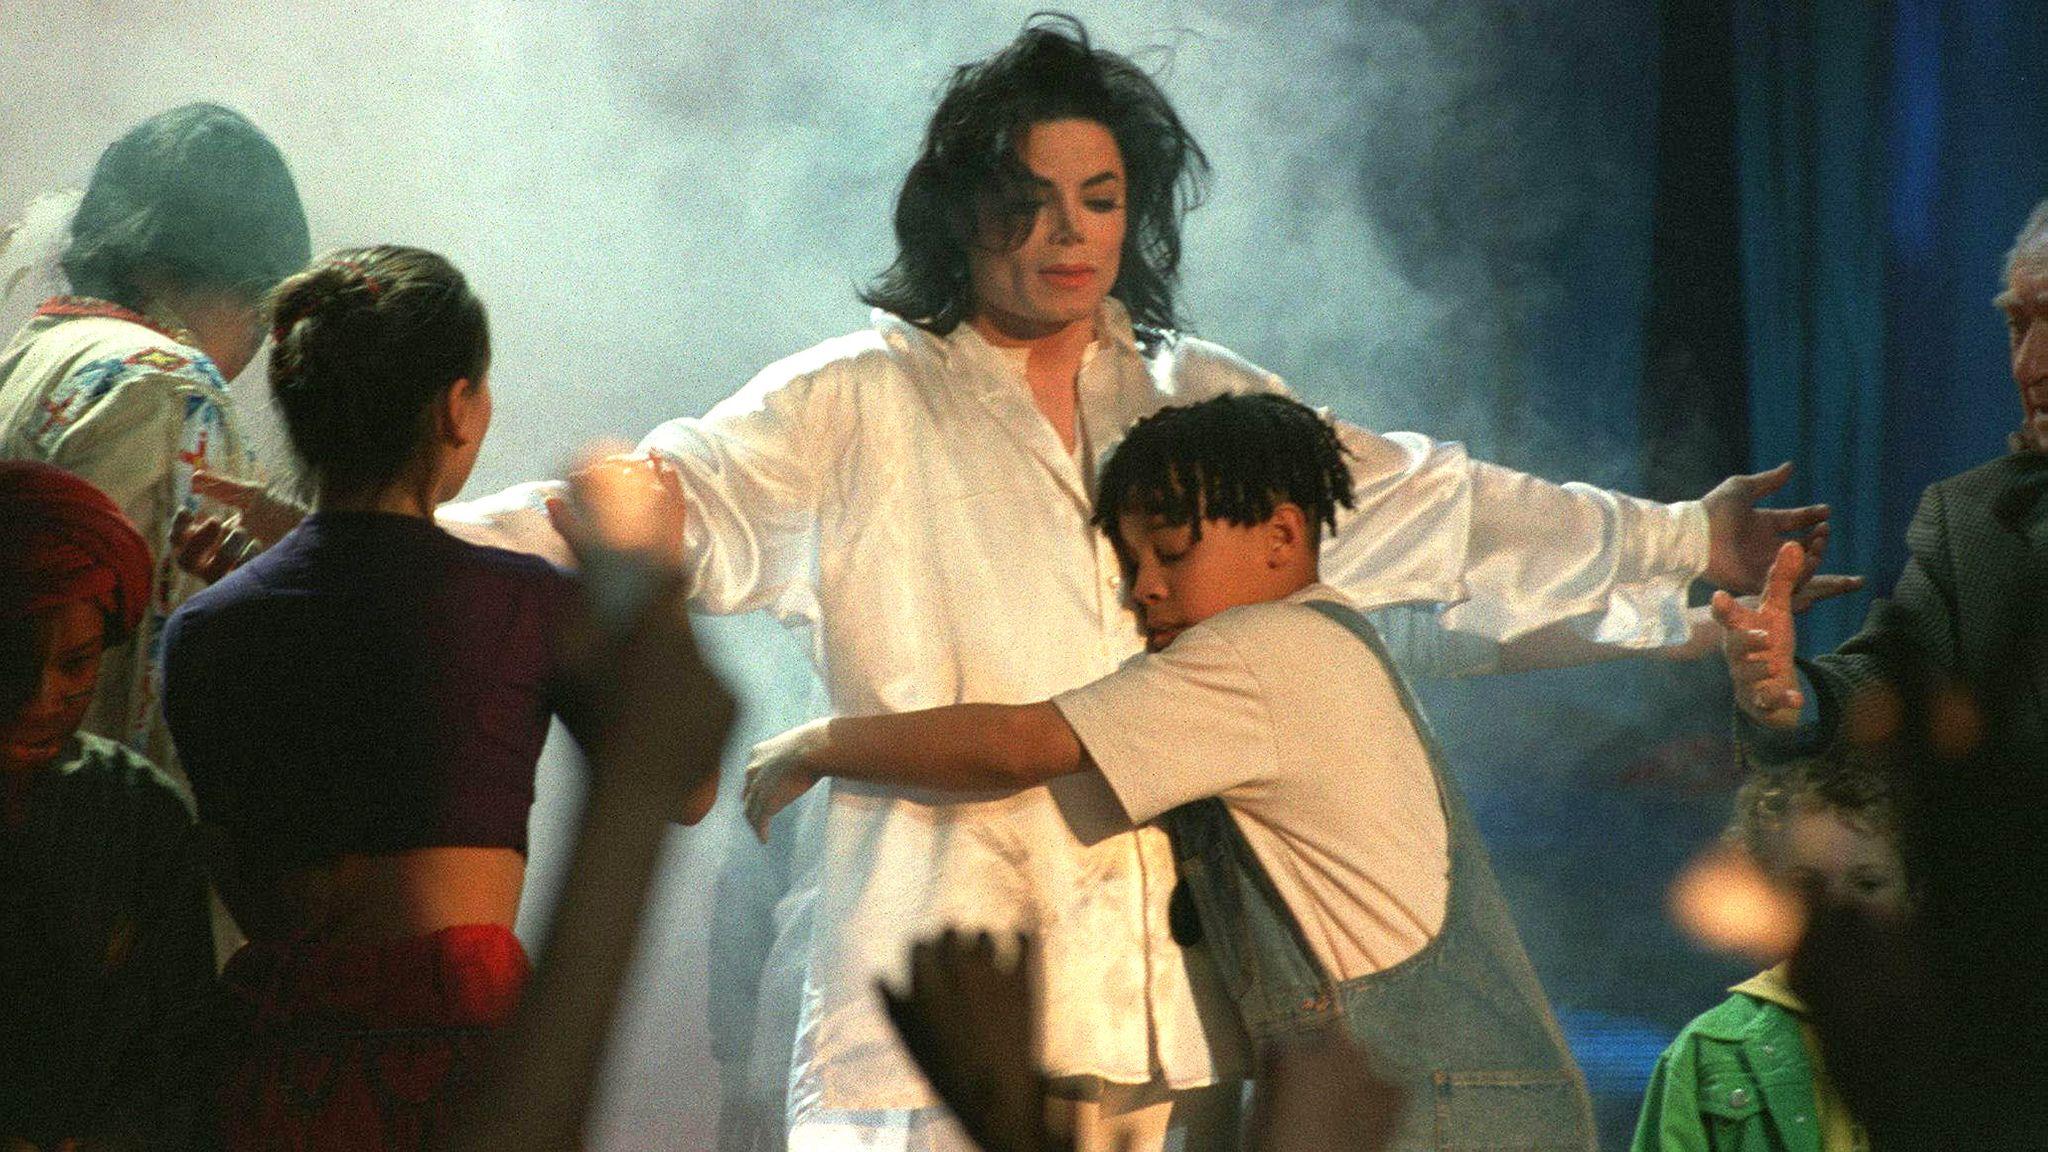 Michael Jackson in 1996